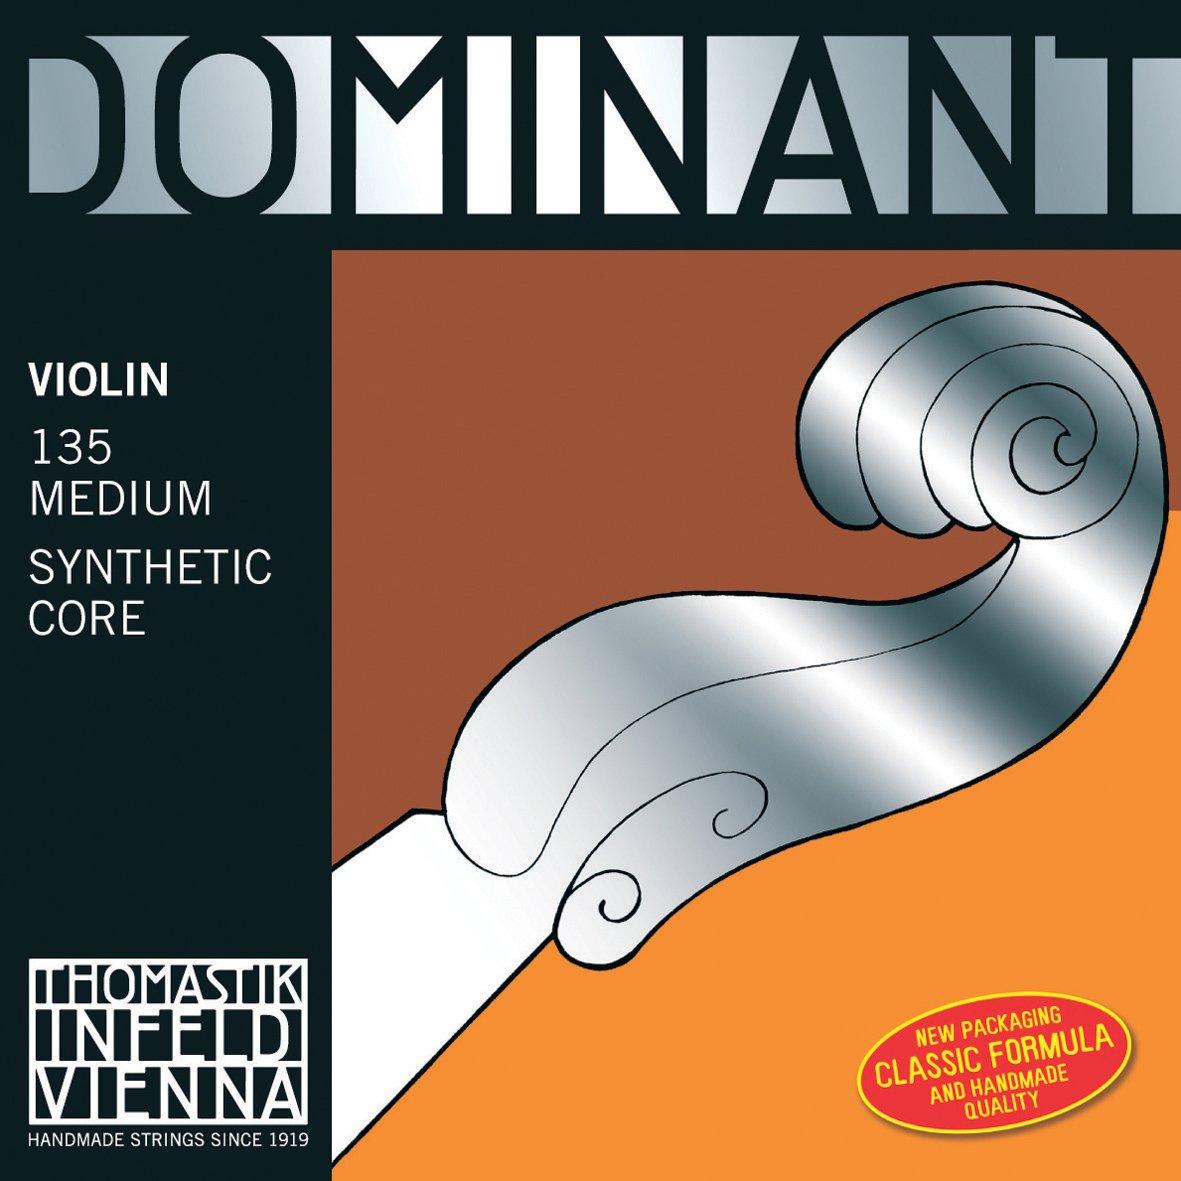 Thomastik-Infeld 1314/4 Dominant 4/4 Scale Nylon Core Violin A-String, Aluminum Wound, Medium Gauge